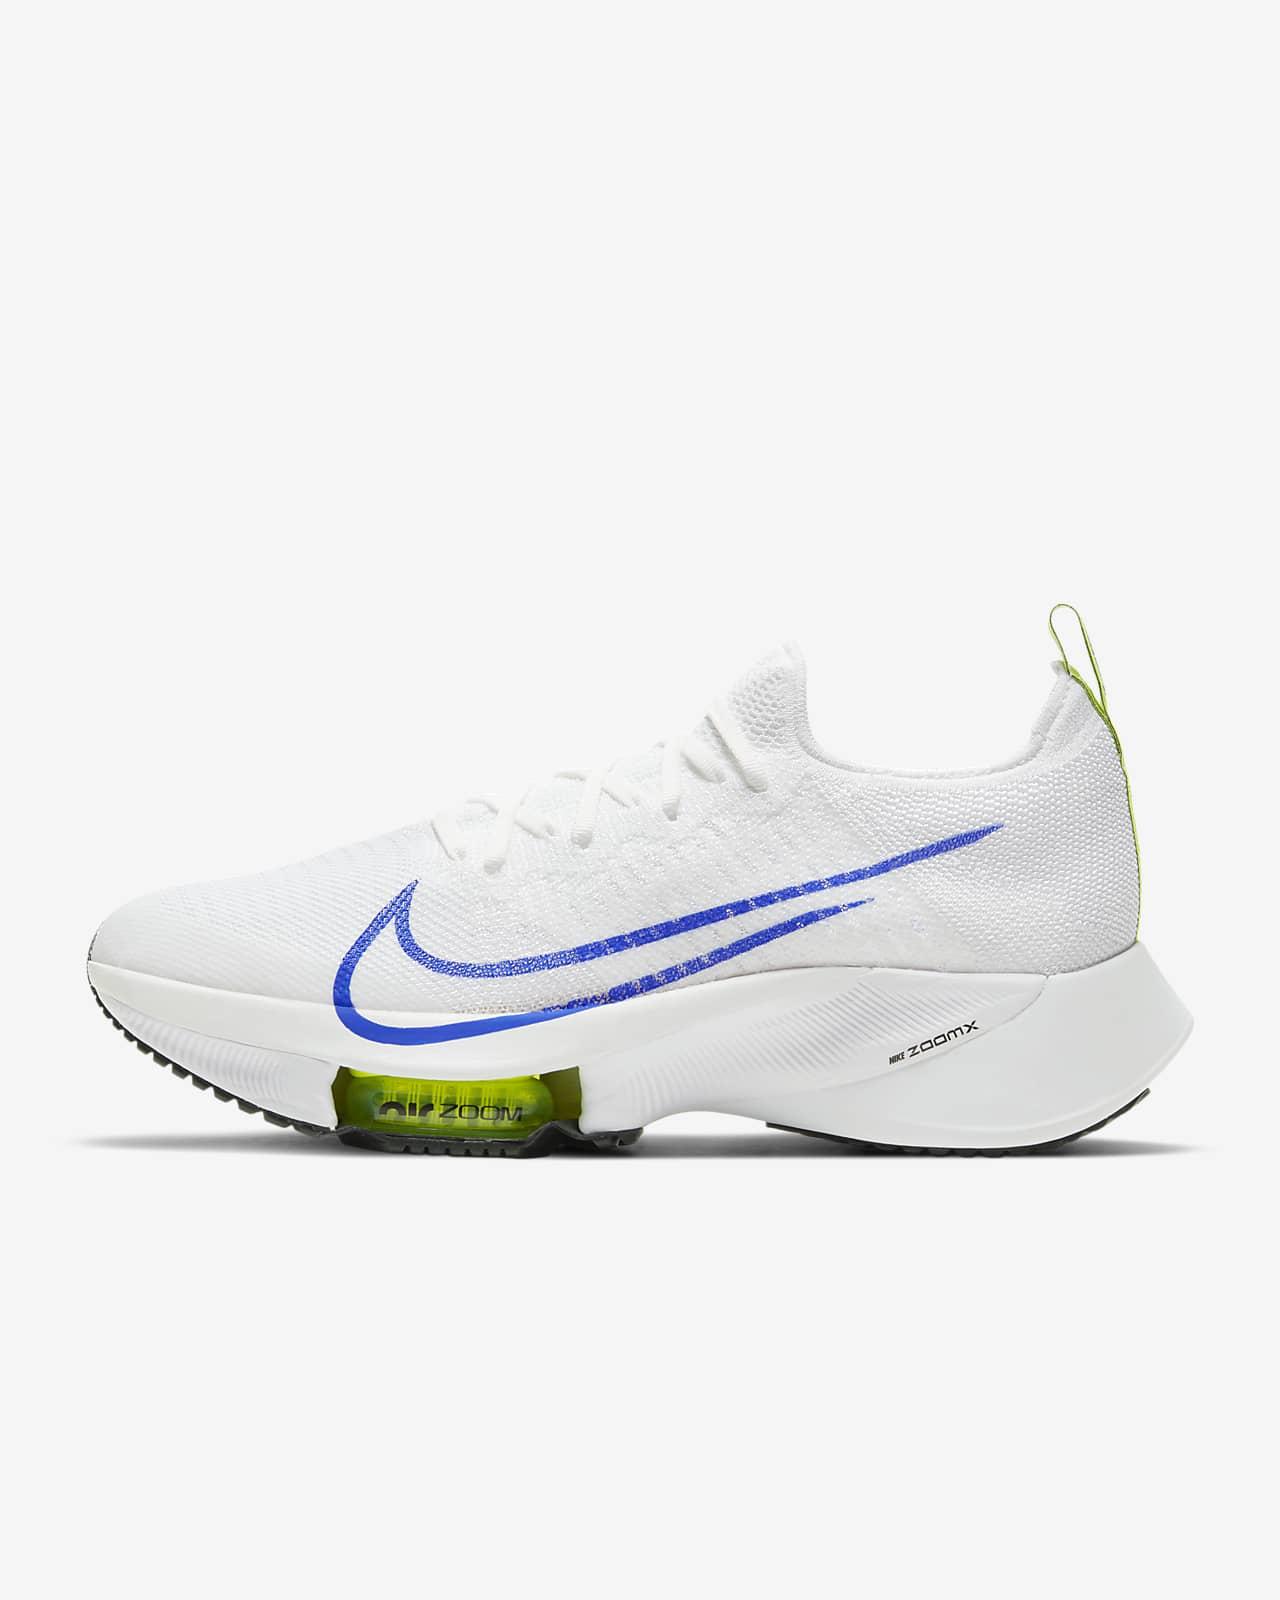 Nike Air Zoom Tempo NEXT% FlyEase løpesko for vei til herre